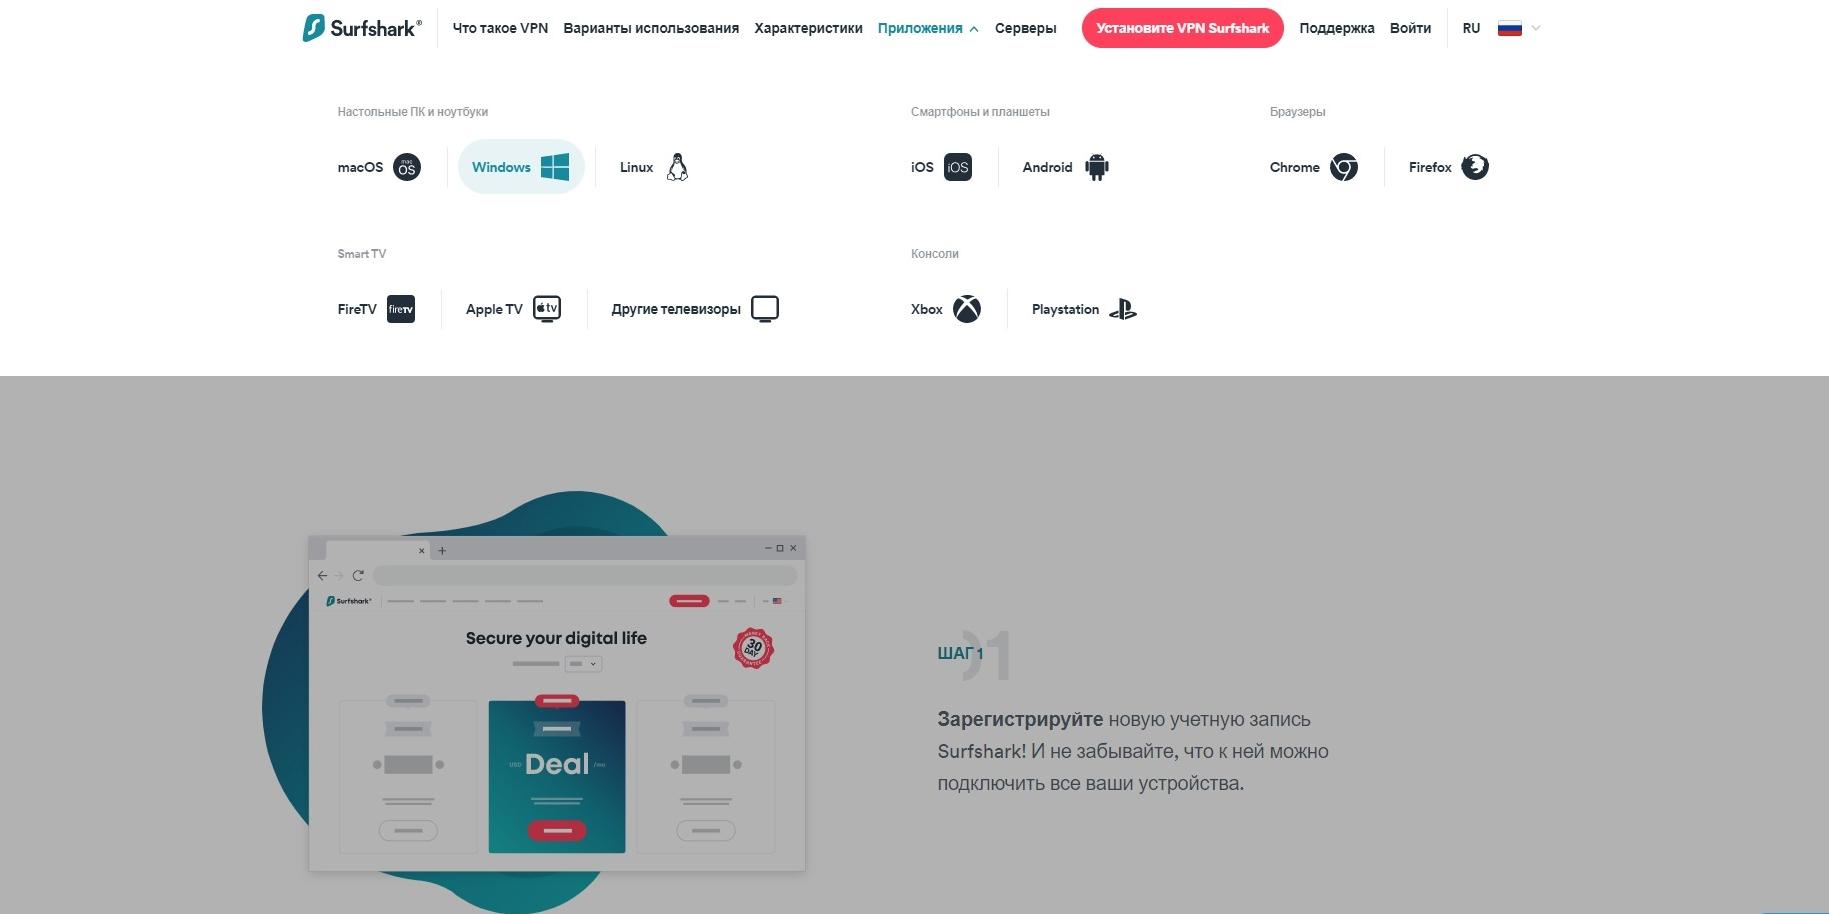 Surfshark доступен на множестве платформ